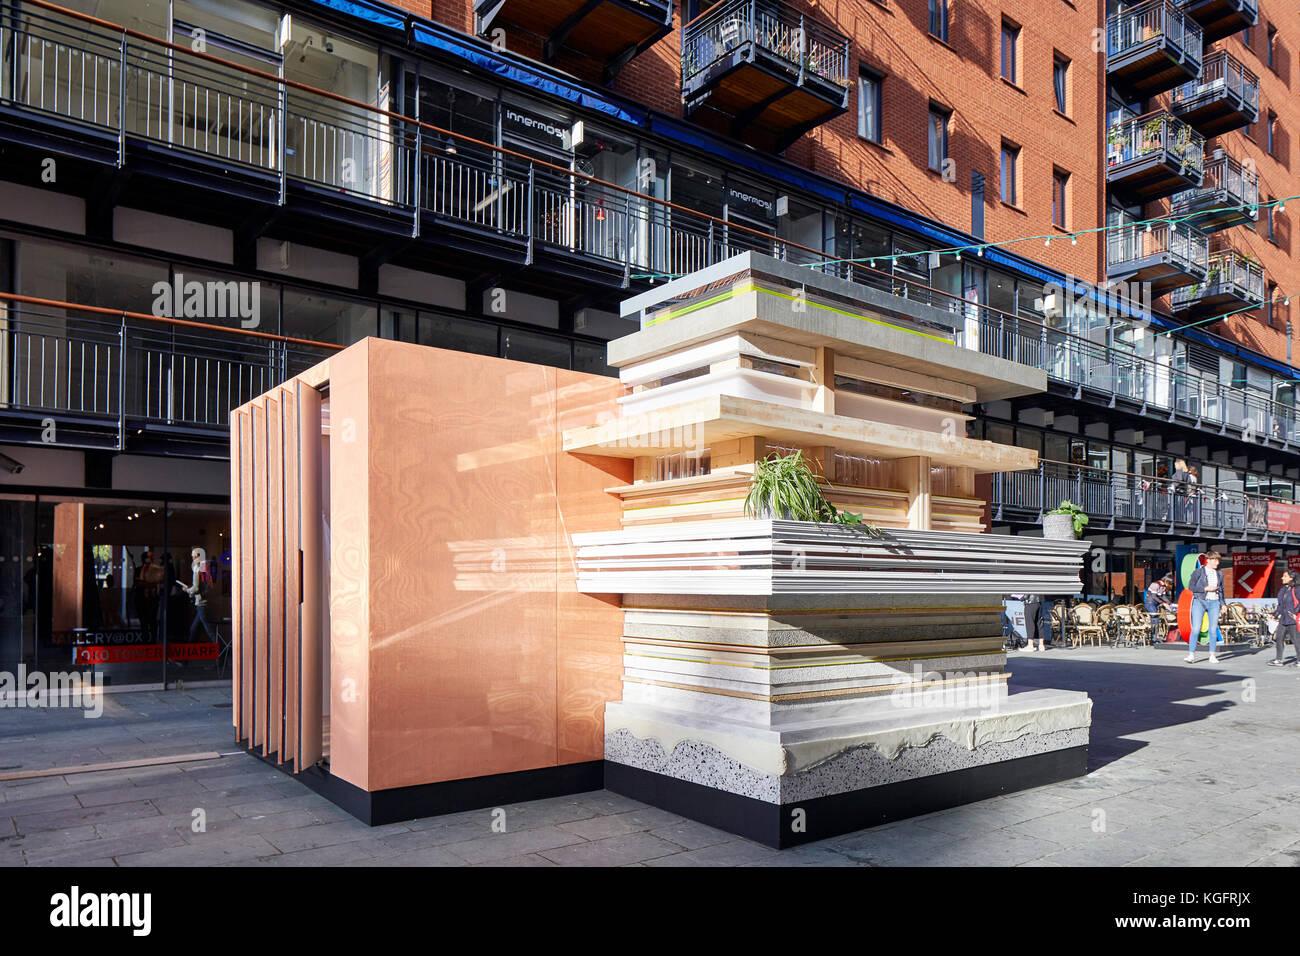 pavillon avec street contexte. la pile - mini cabine urbain vivant